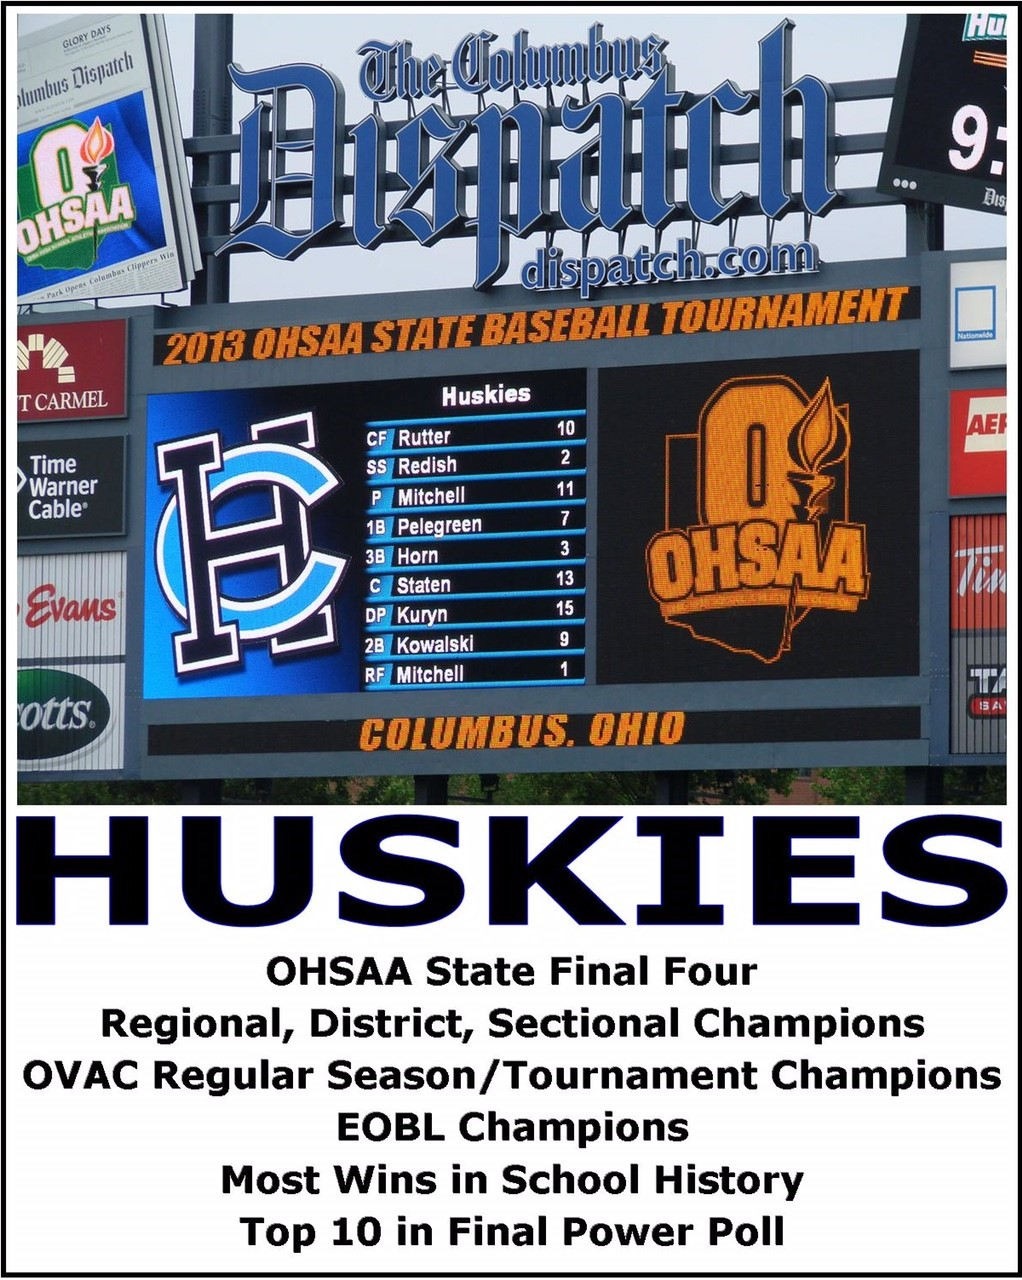 Regional, District, Sectional Champions, OVAC Regular Season/Tournament Champions, EOBL Champions